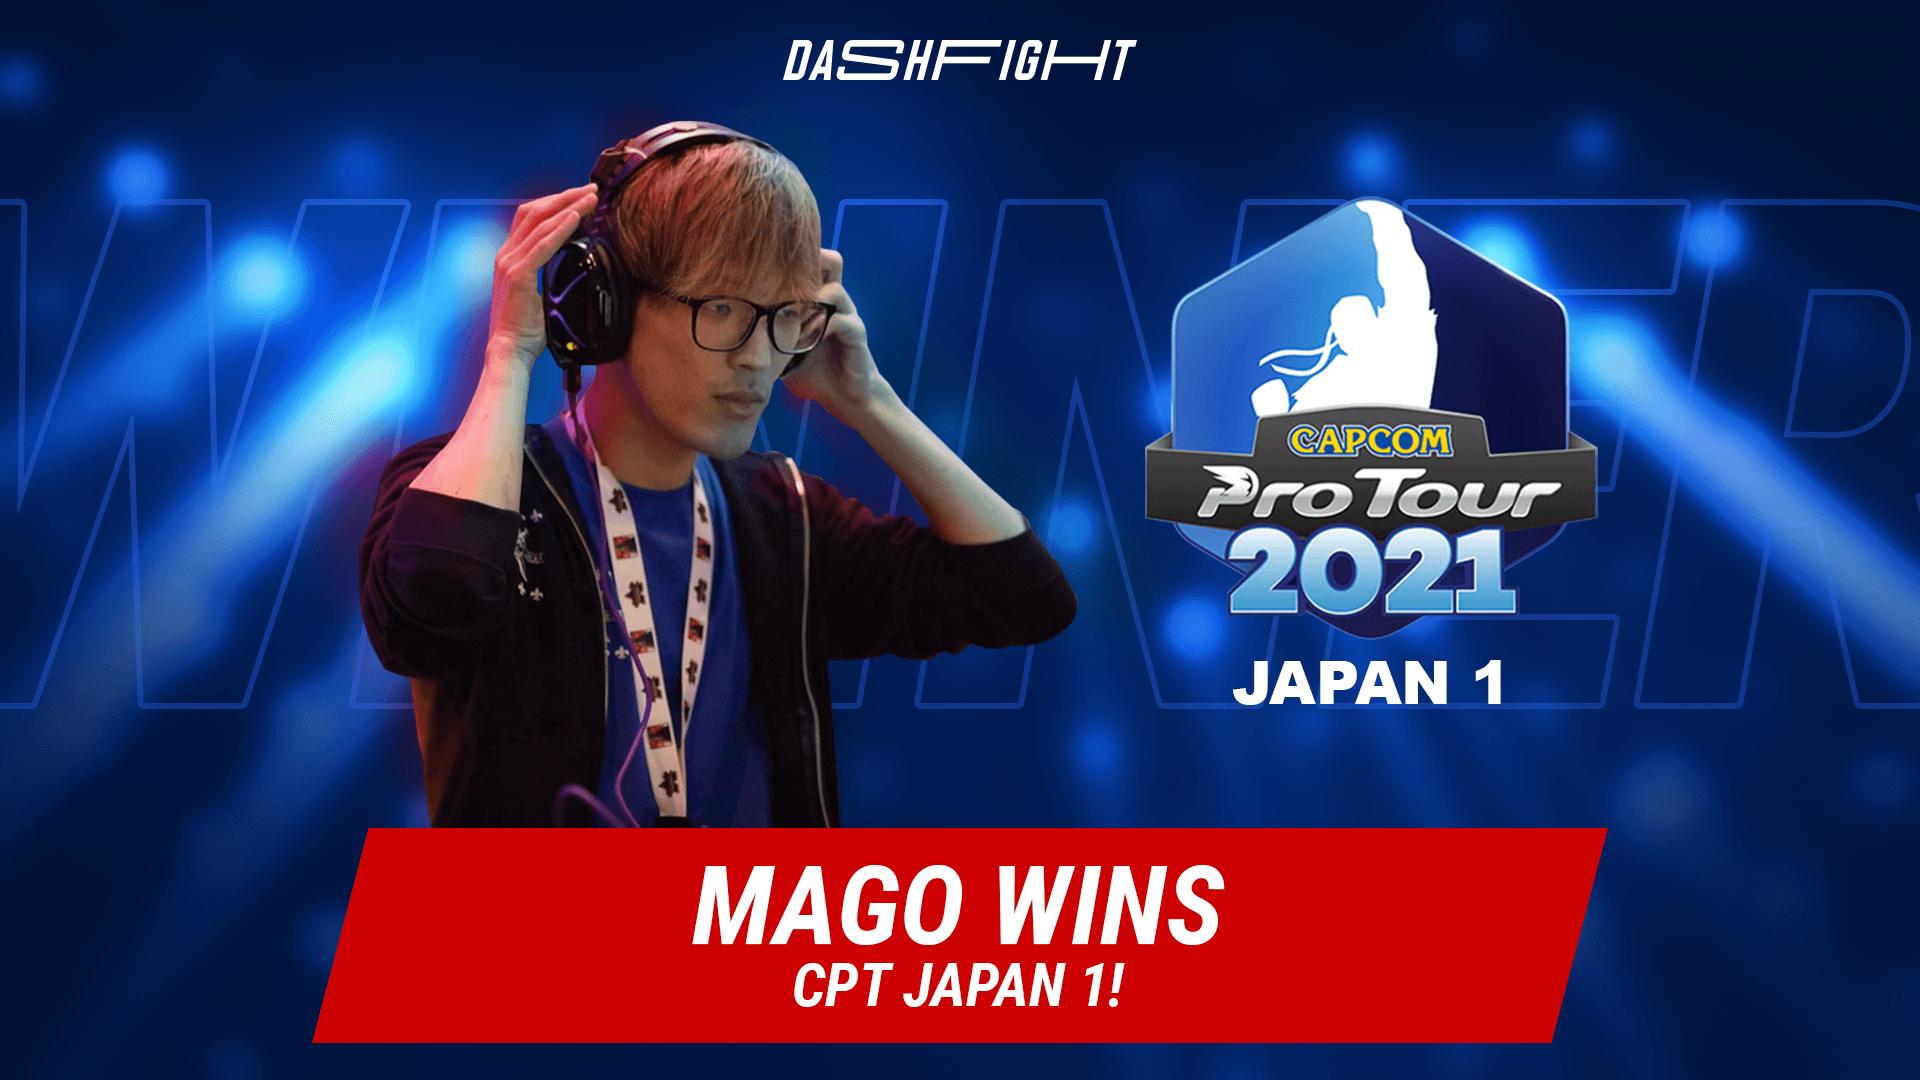 Powerful Start of Capcom Pro Tour 2021 - Japan 1